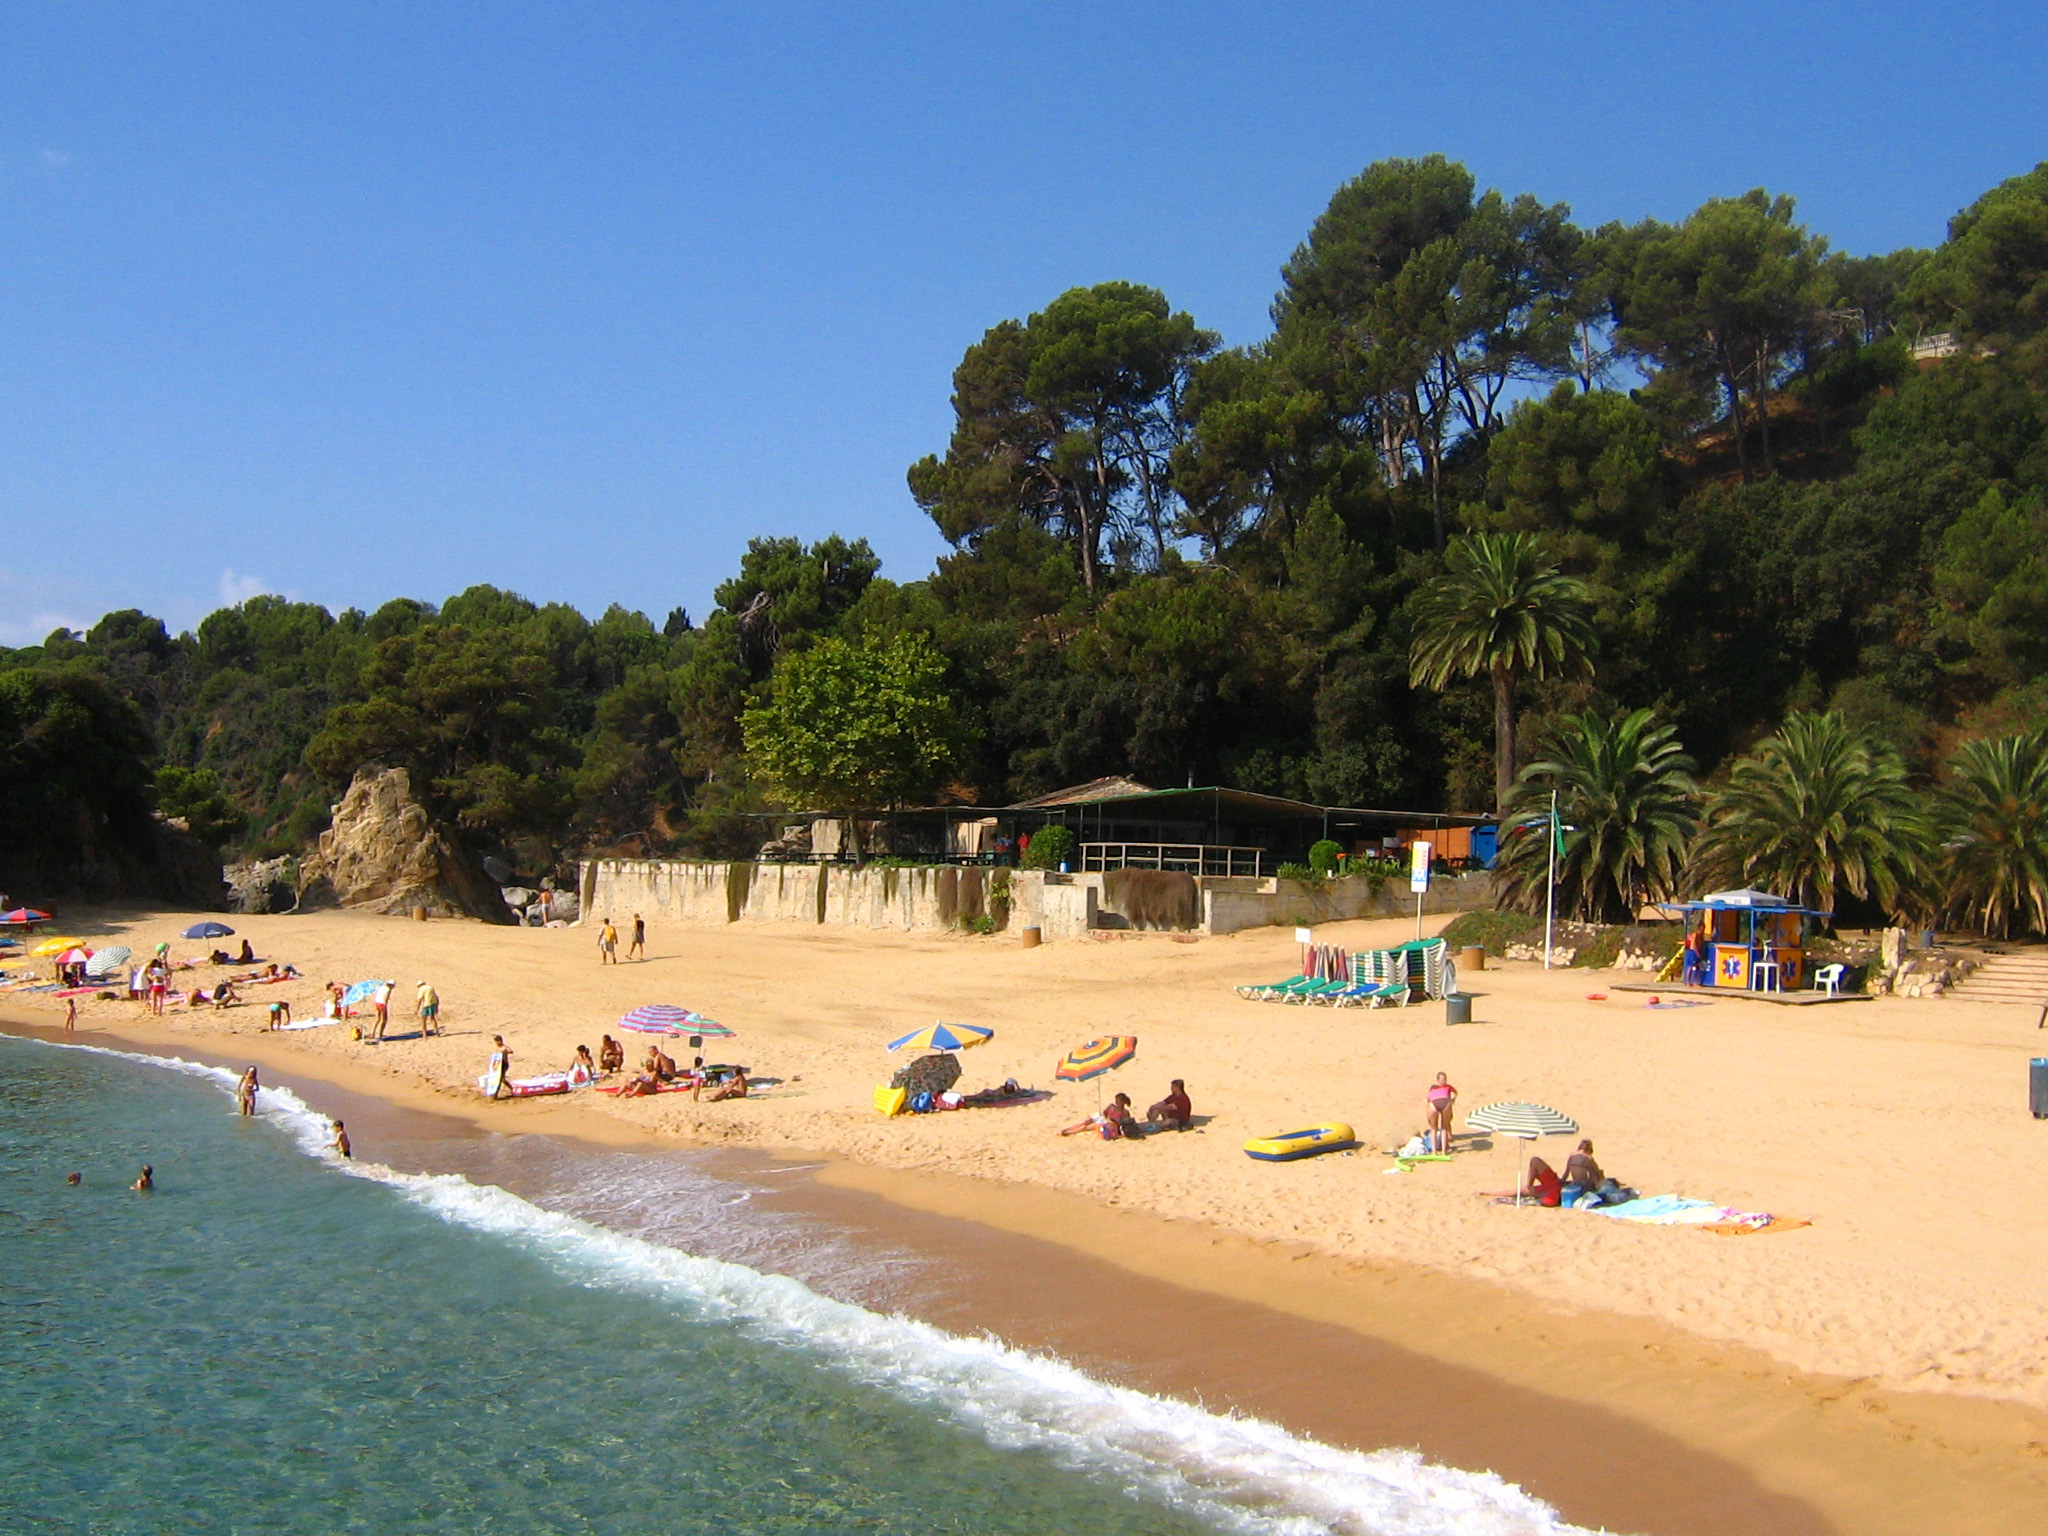 File:Costa Brava.jpg - Wikipedia